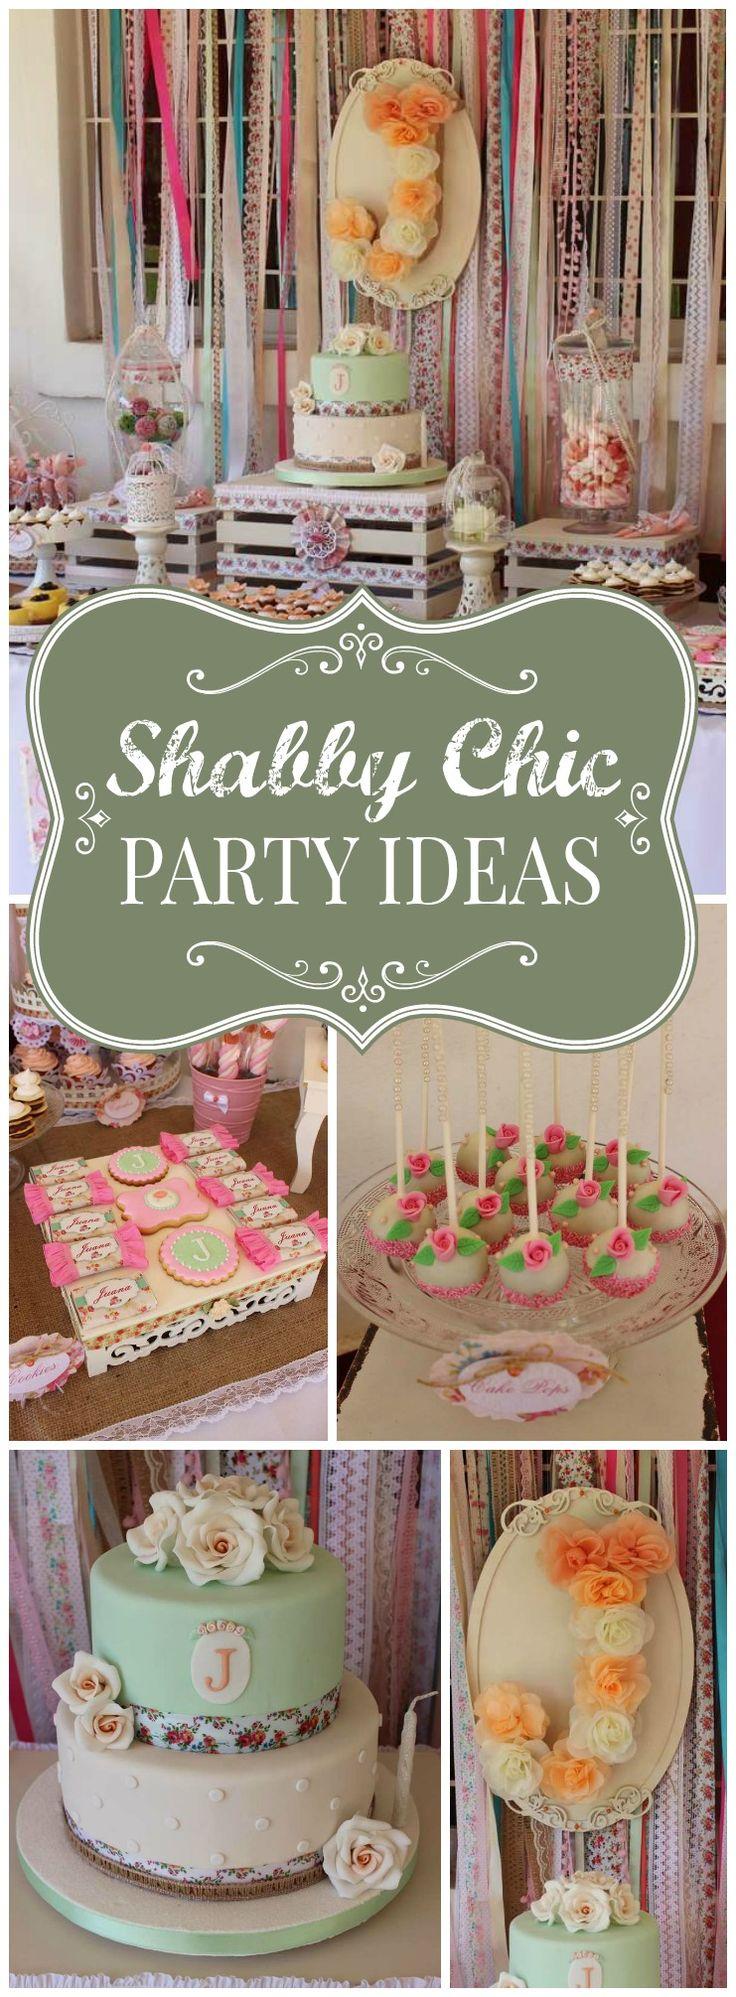 Best 25 Retro birthday parties ideas on Pinterest Retro party